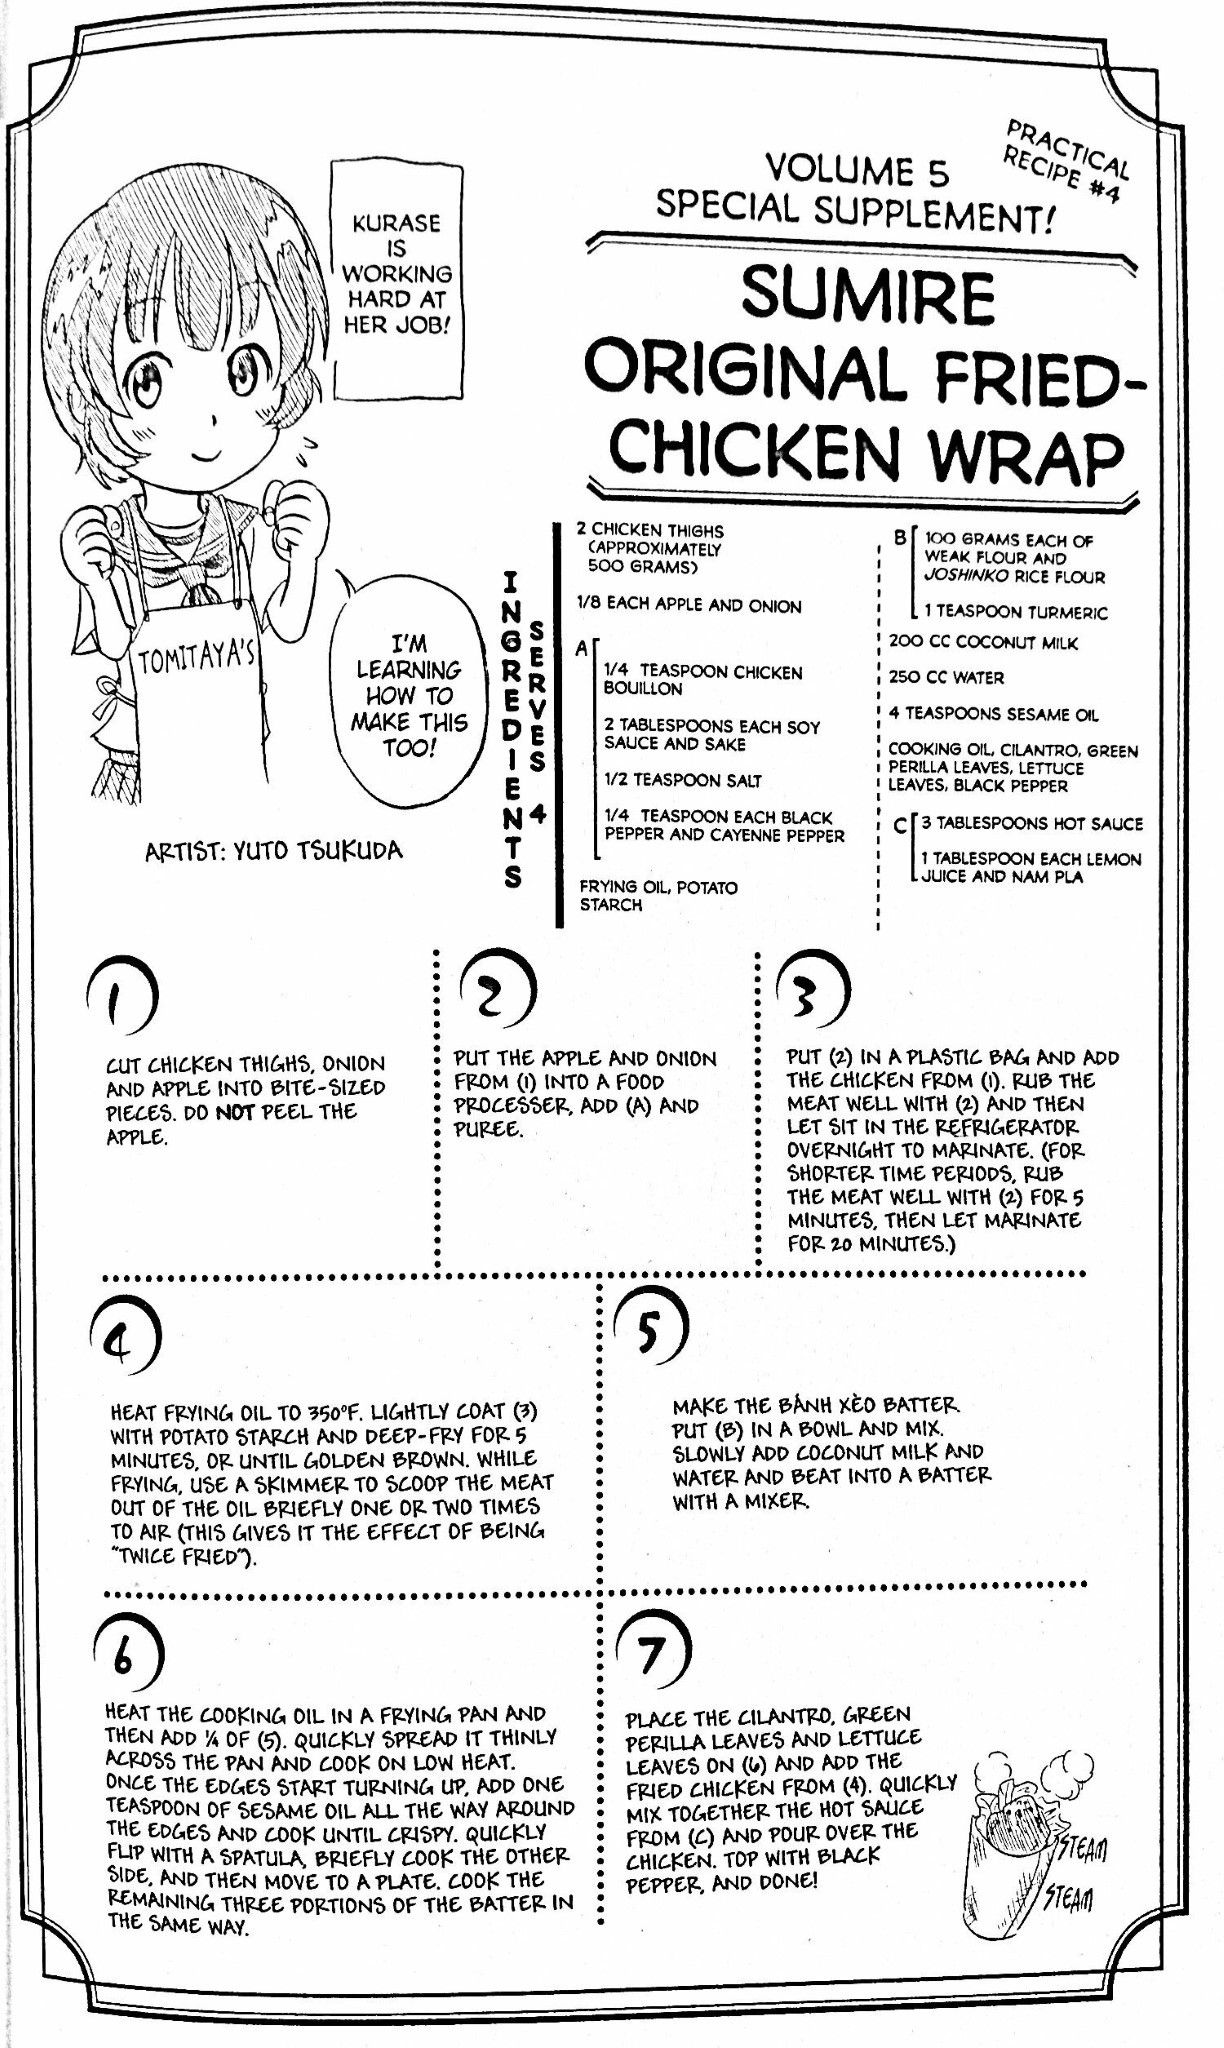 Fried Chicken Wrap From Kurase